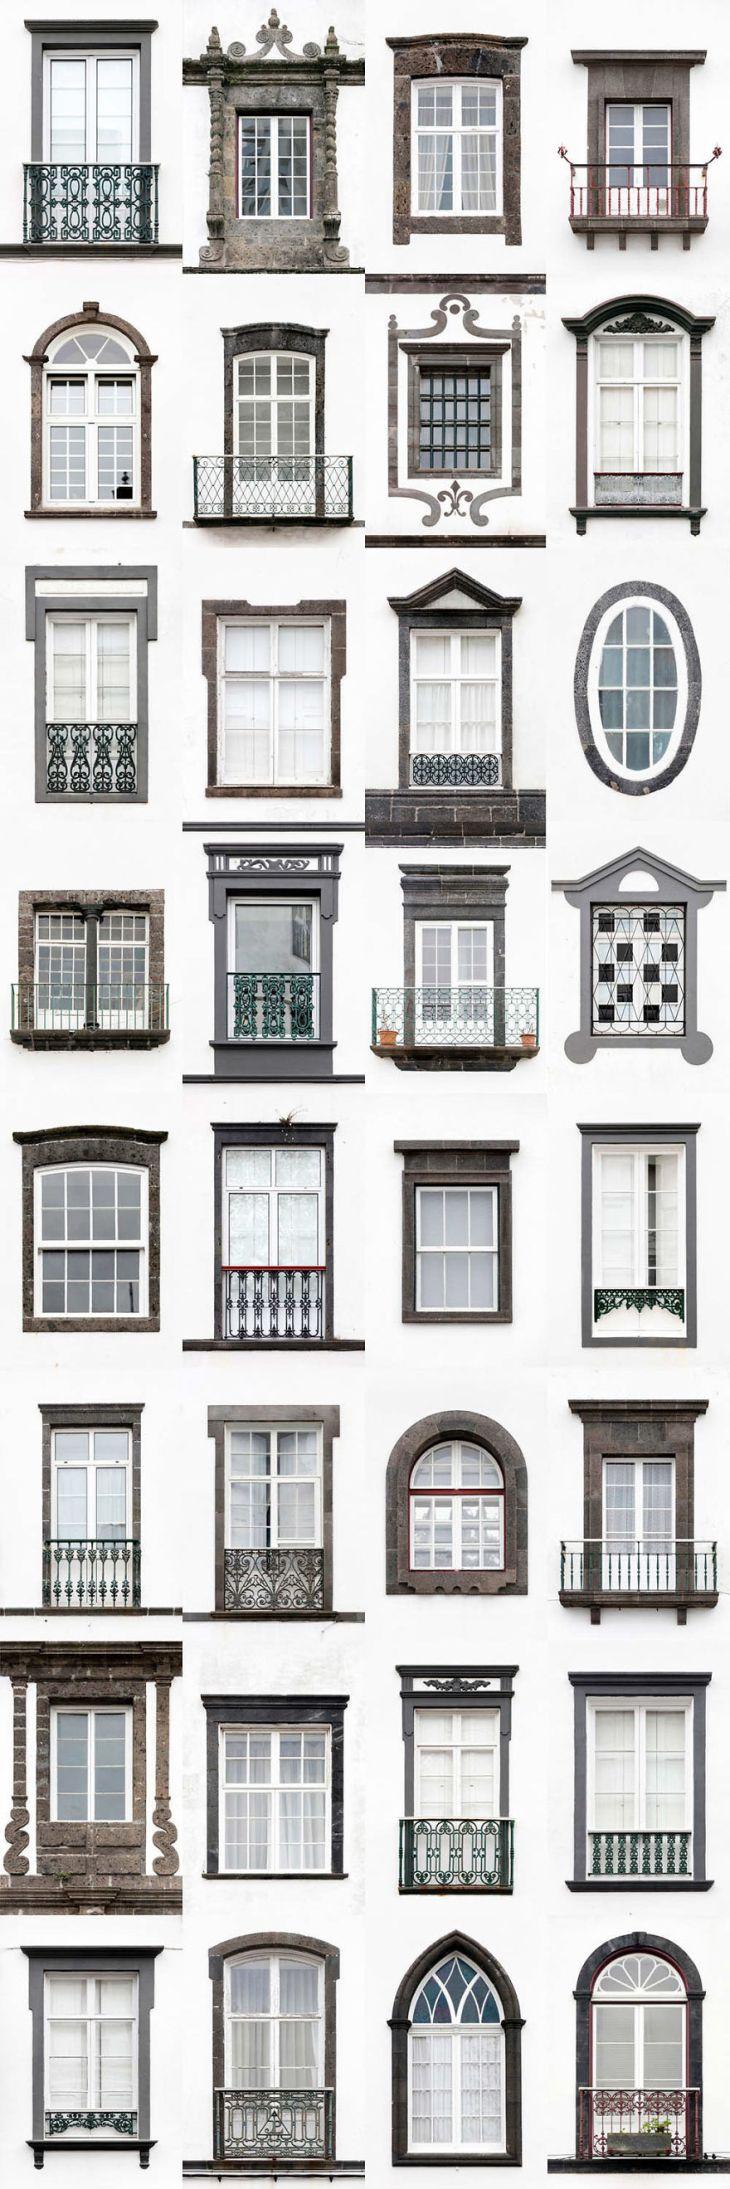 I-traveled-all-over-portugal-to-photograph-windows-more-than-3200-59edaf4e89e02__880